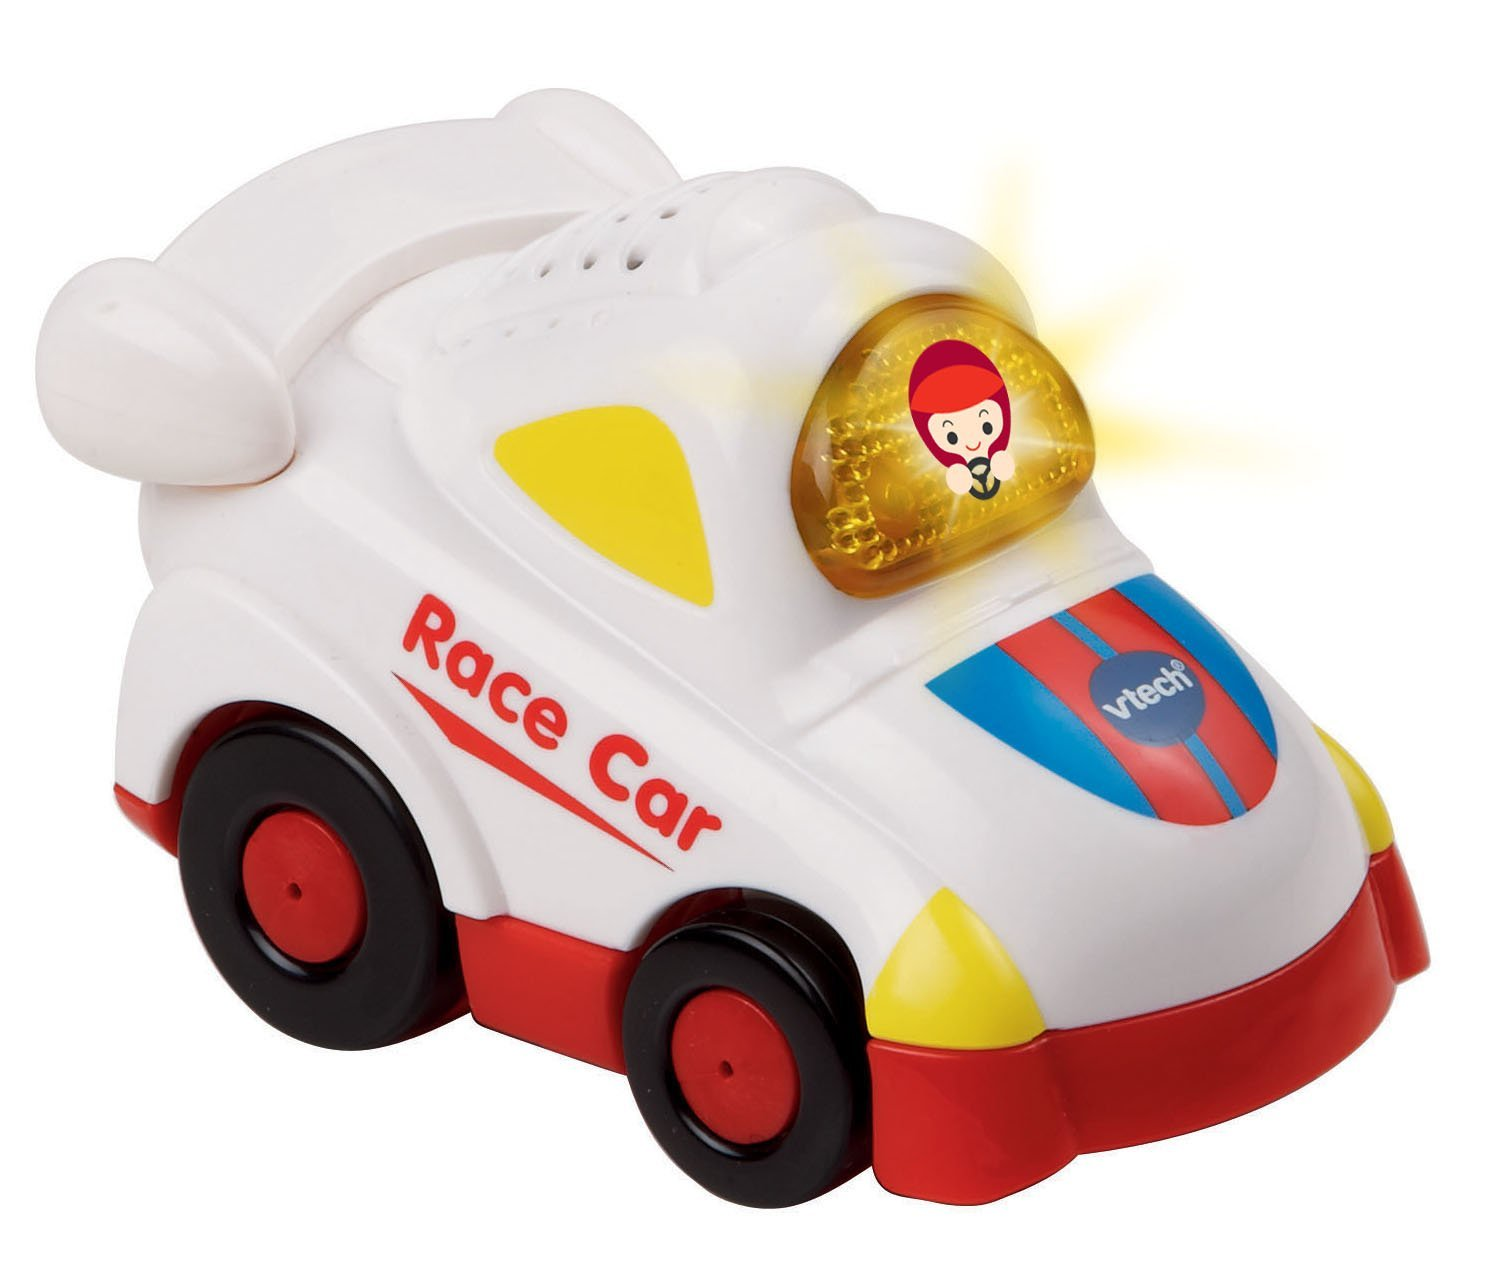 VTech Go! Go! Smart Wheels Race Car Only $2.99